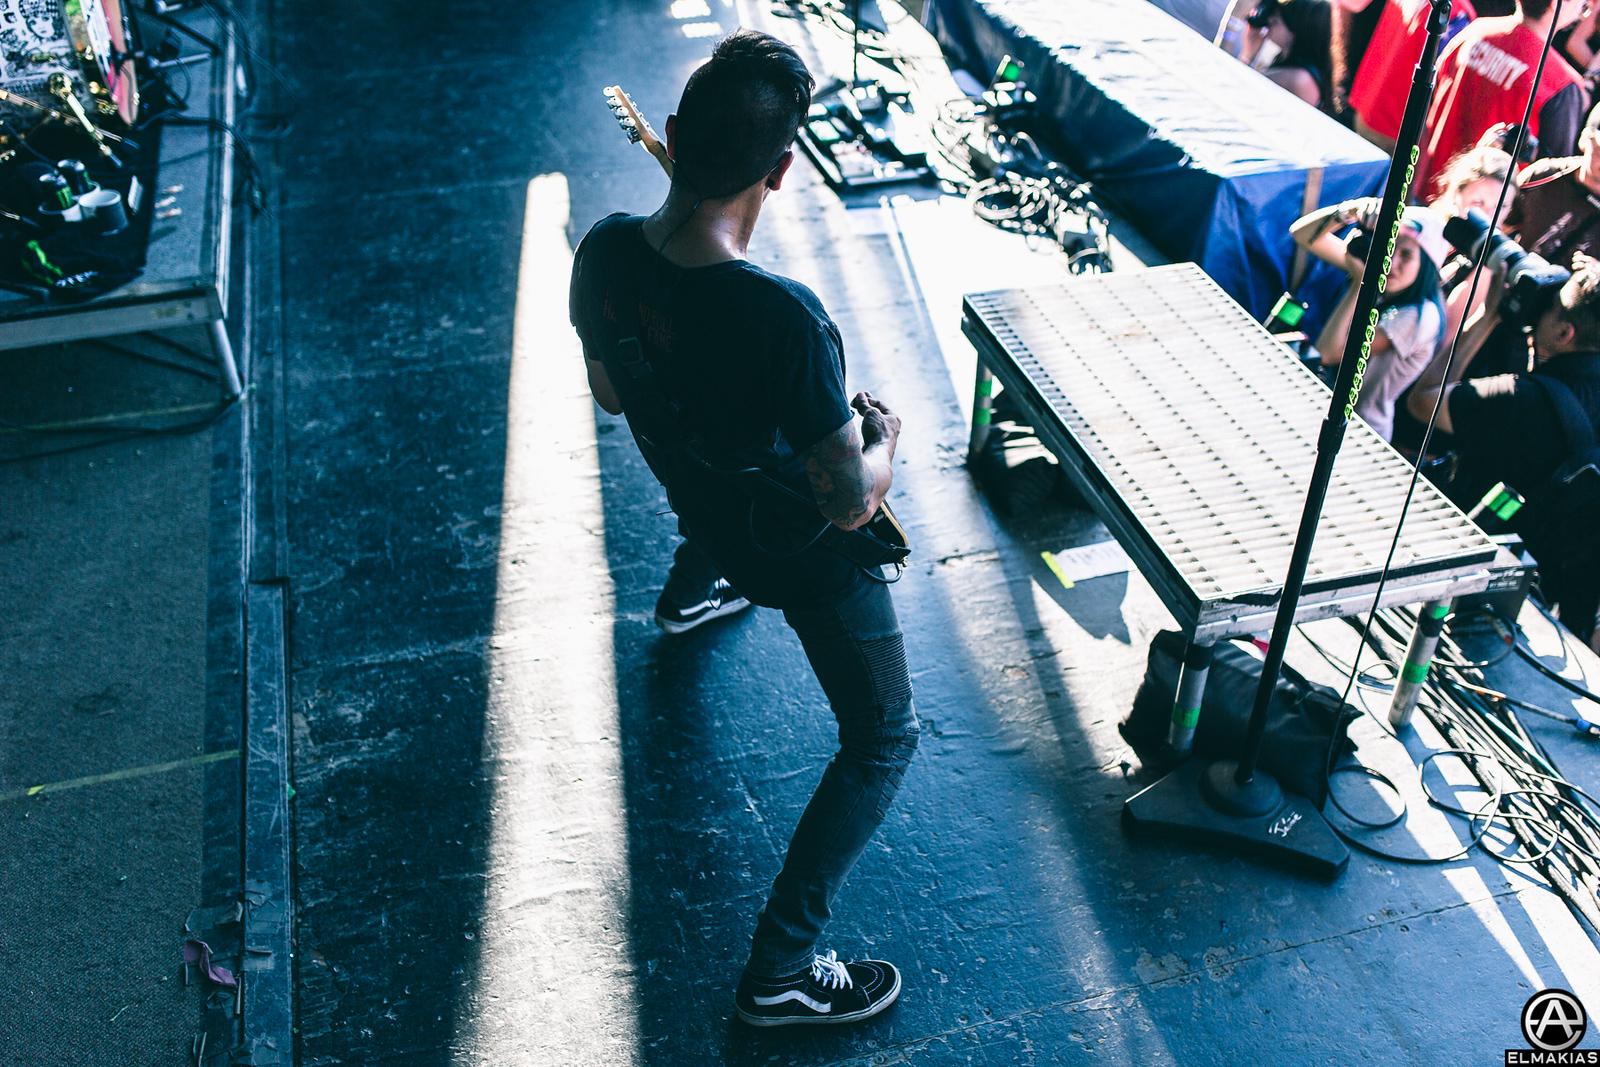 Jesse Barrera with Pierce the Veil at Warped Tour 2015 by Adam Elmakias